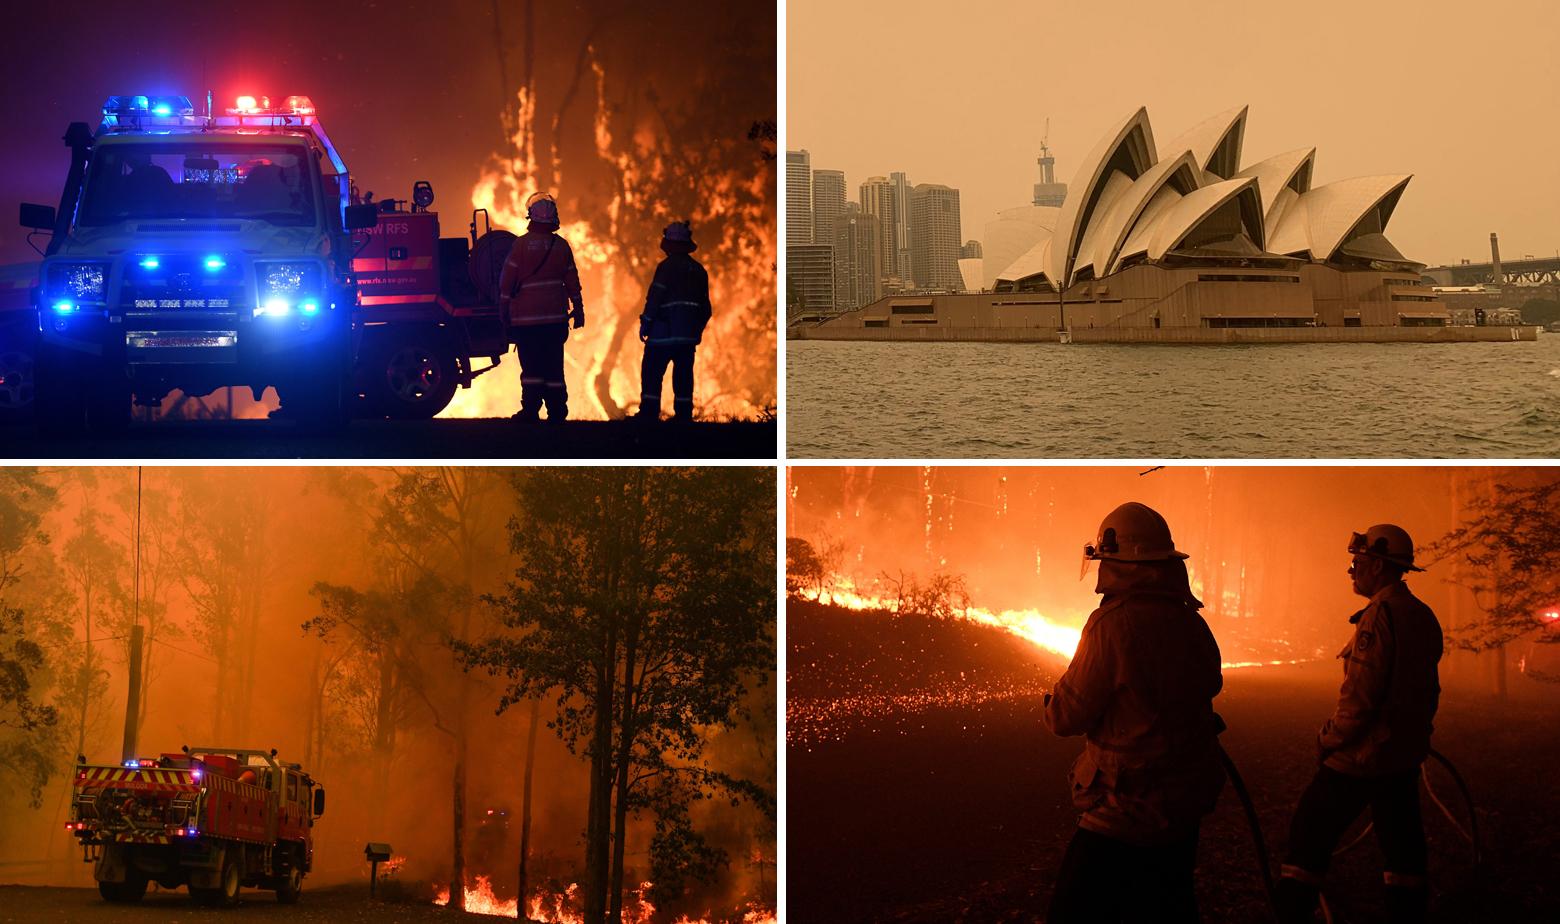 Prizori iz Australije gdje nadomak Sydneyja hara požar